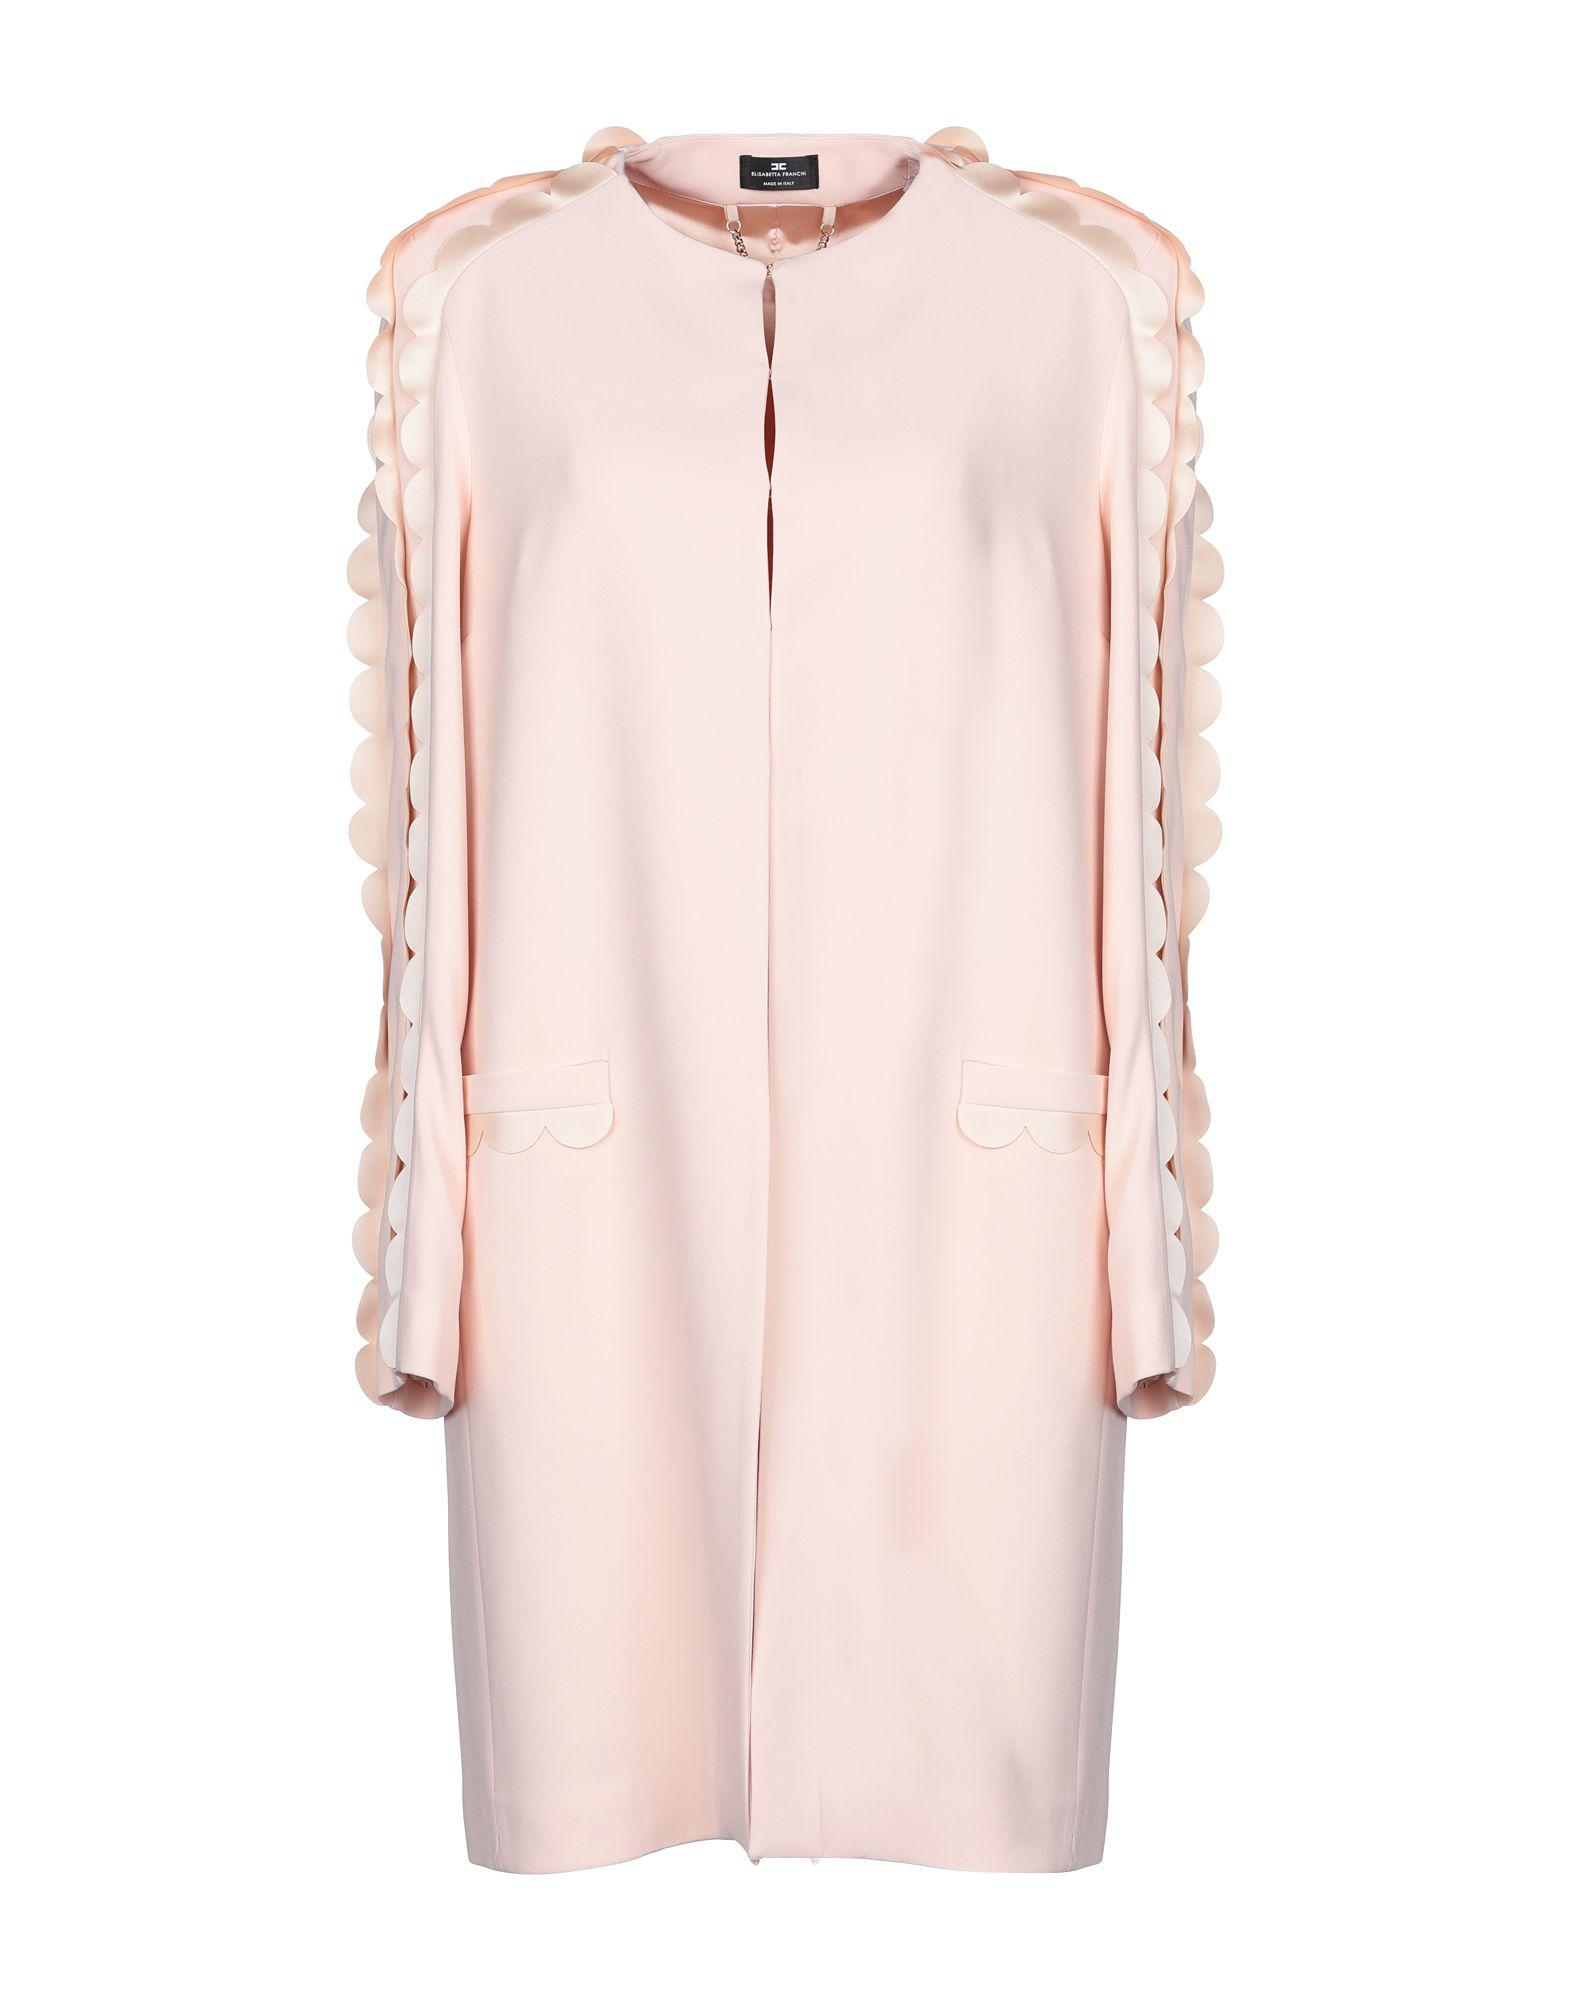 Elisabetta Franchi Coat in Pink - Lyst a6f8d4db8